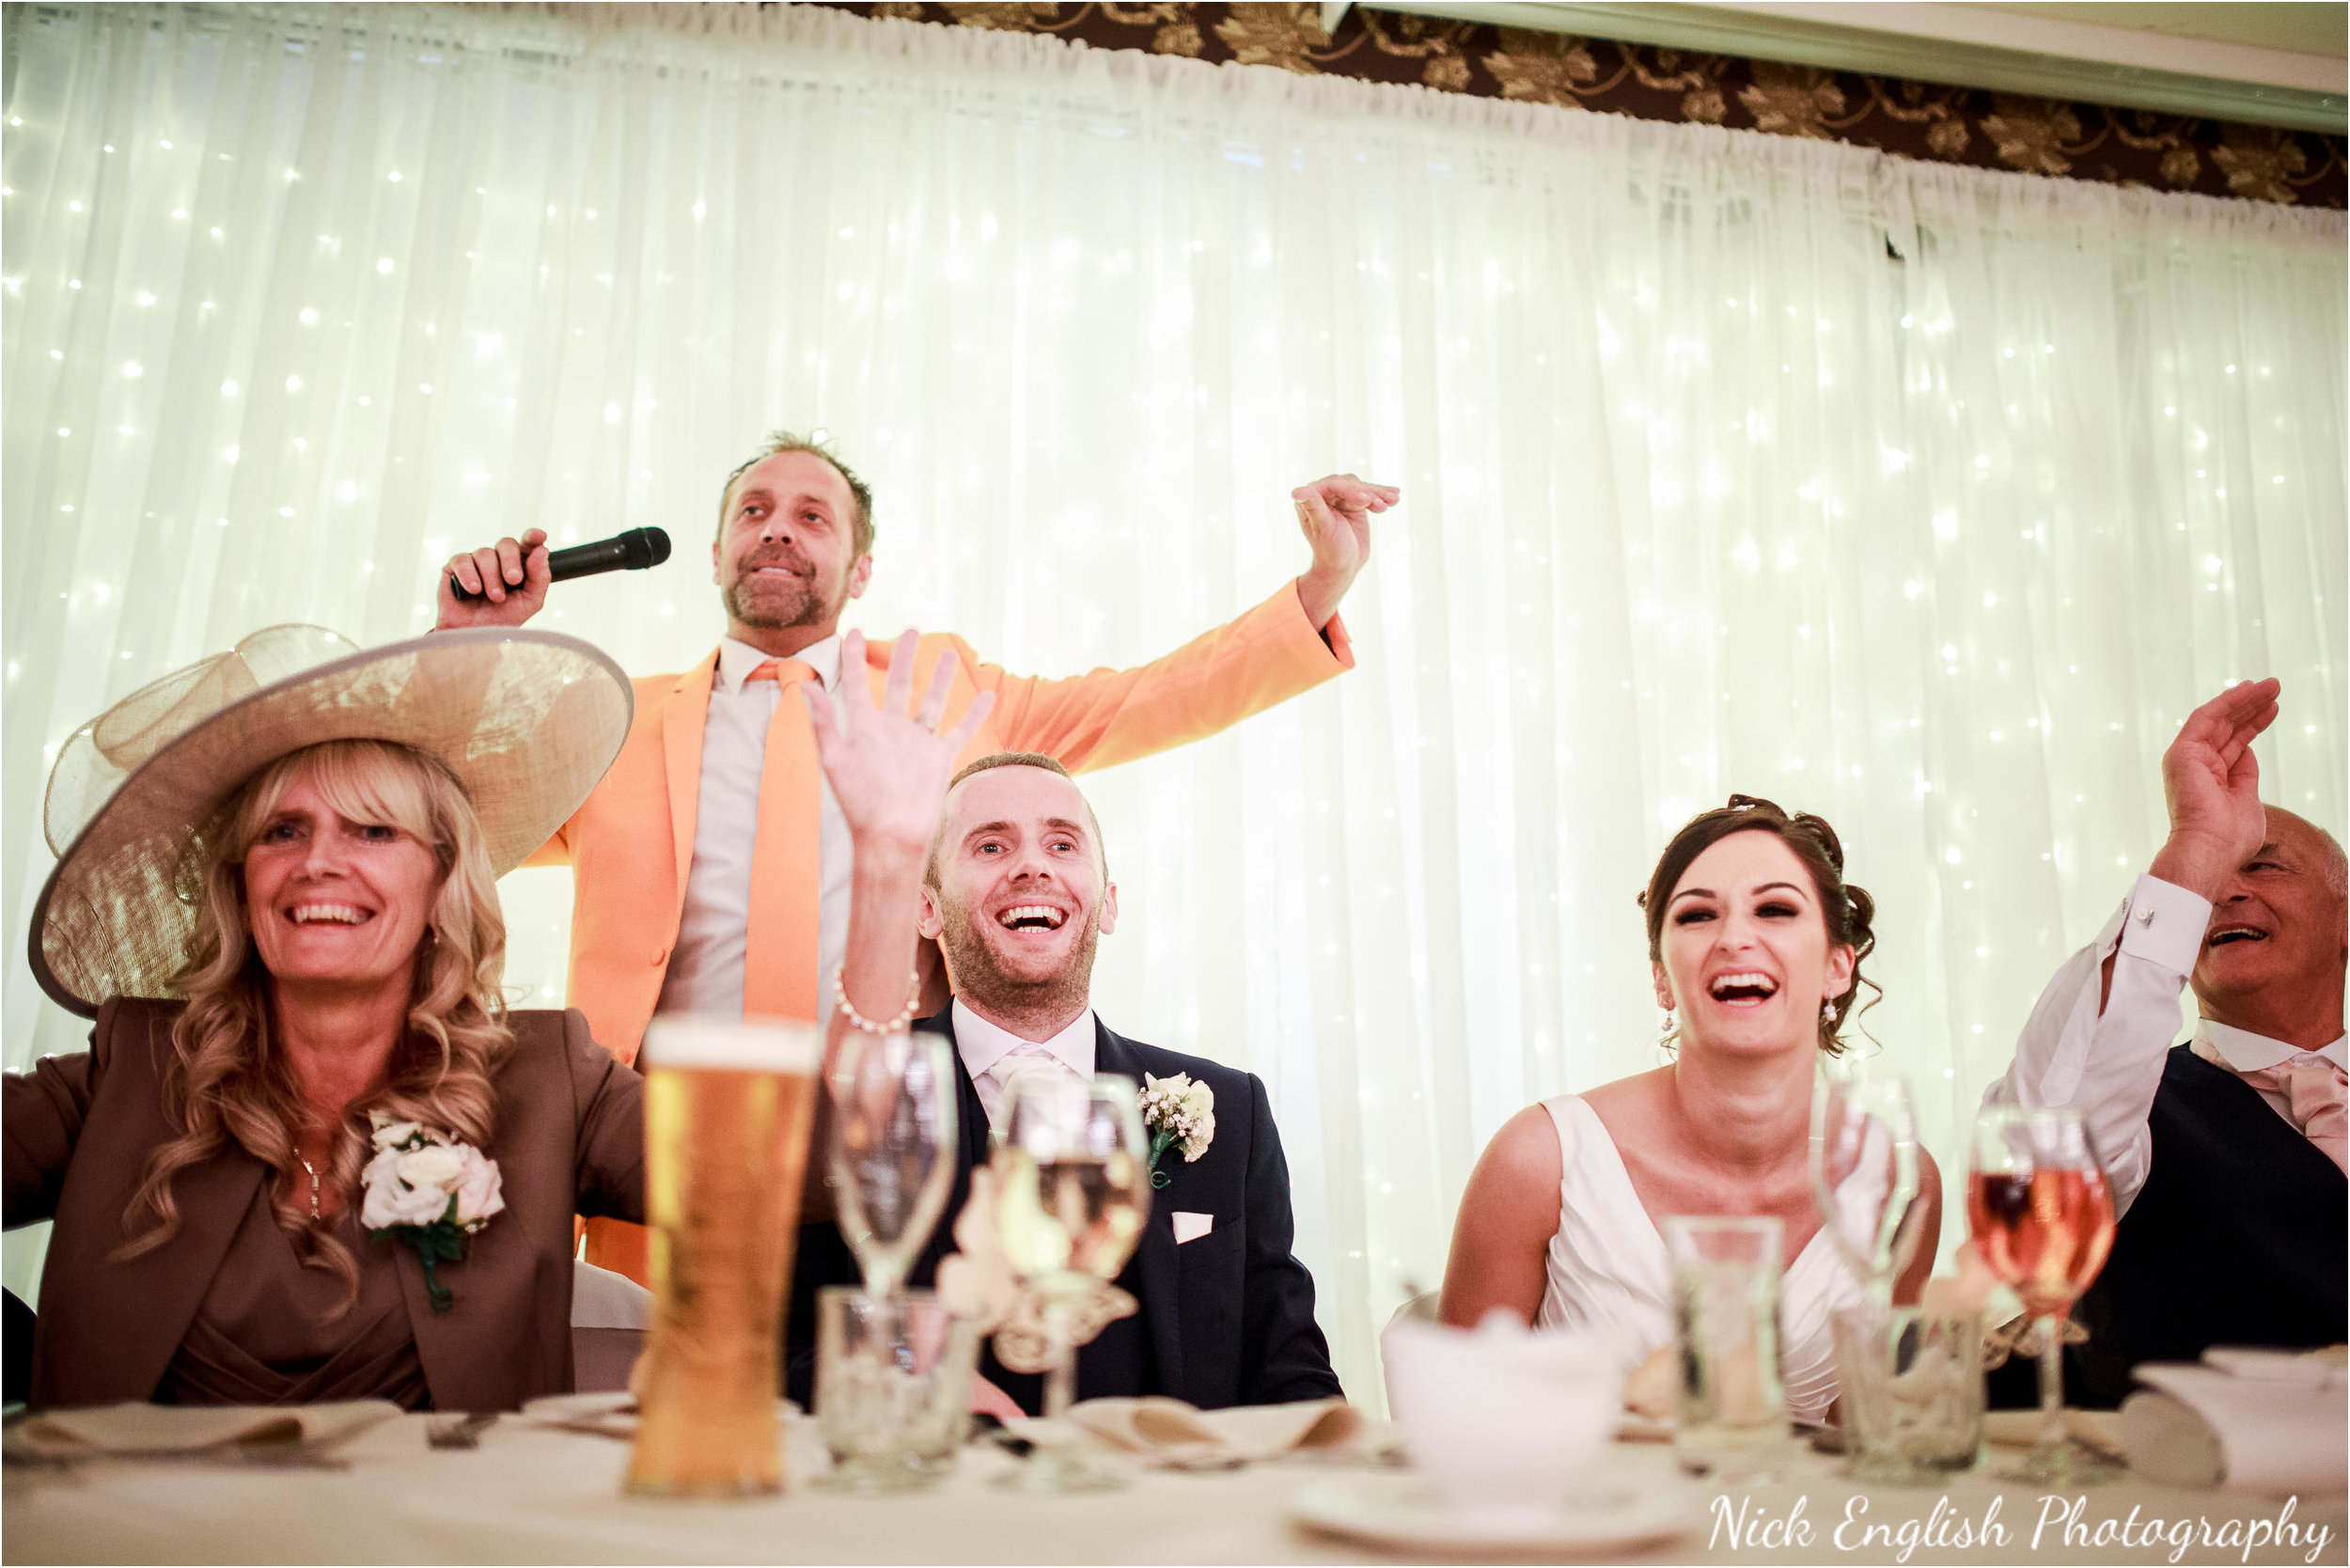 Emily David Wedding Photographs at Barton Grange Preston by Nick English Photography 166jpg.jpeg